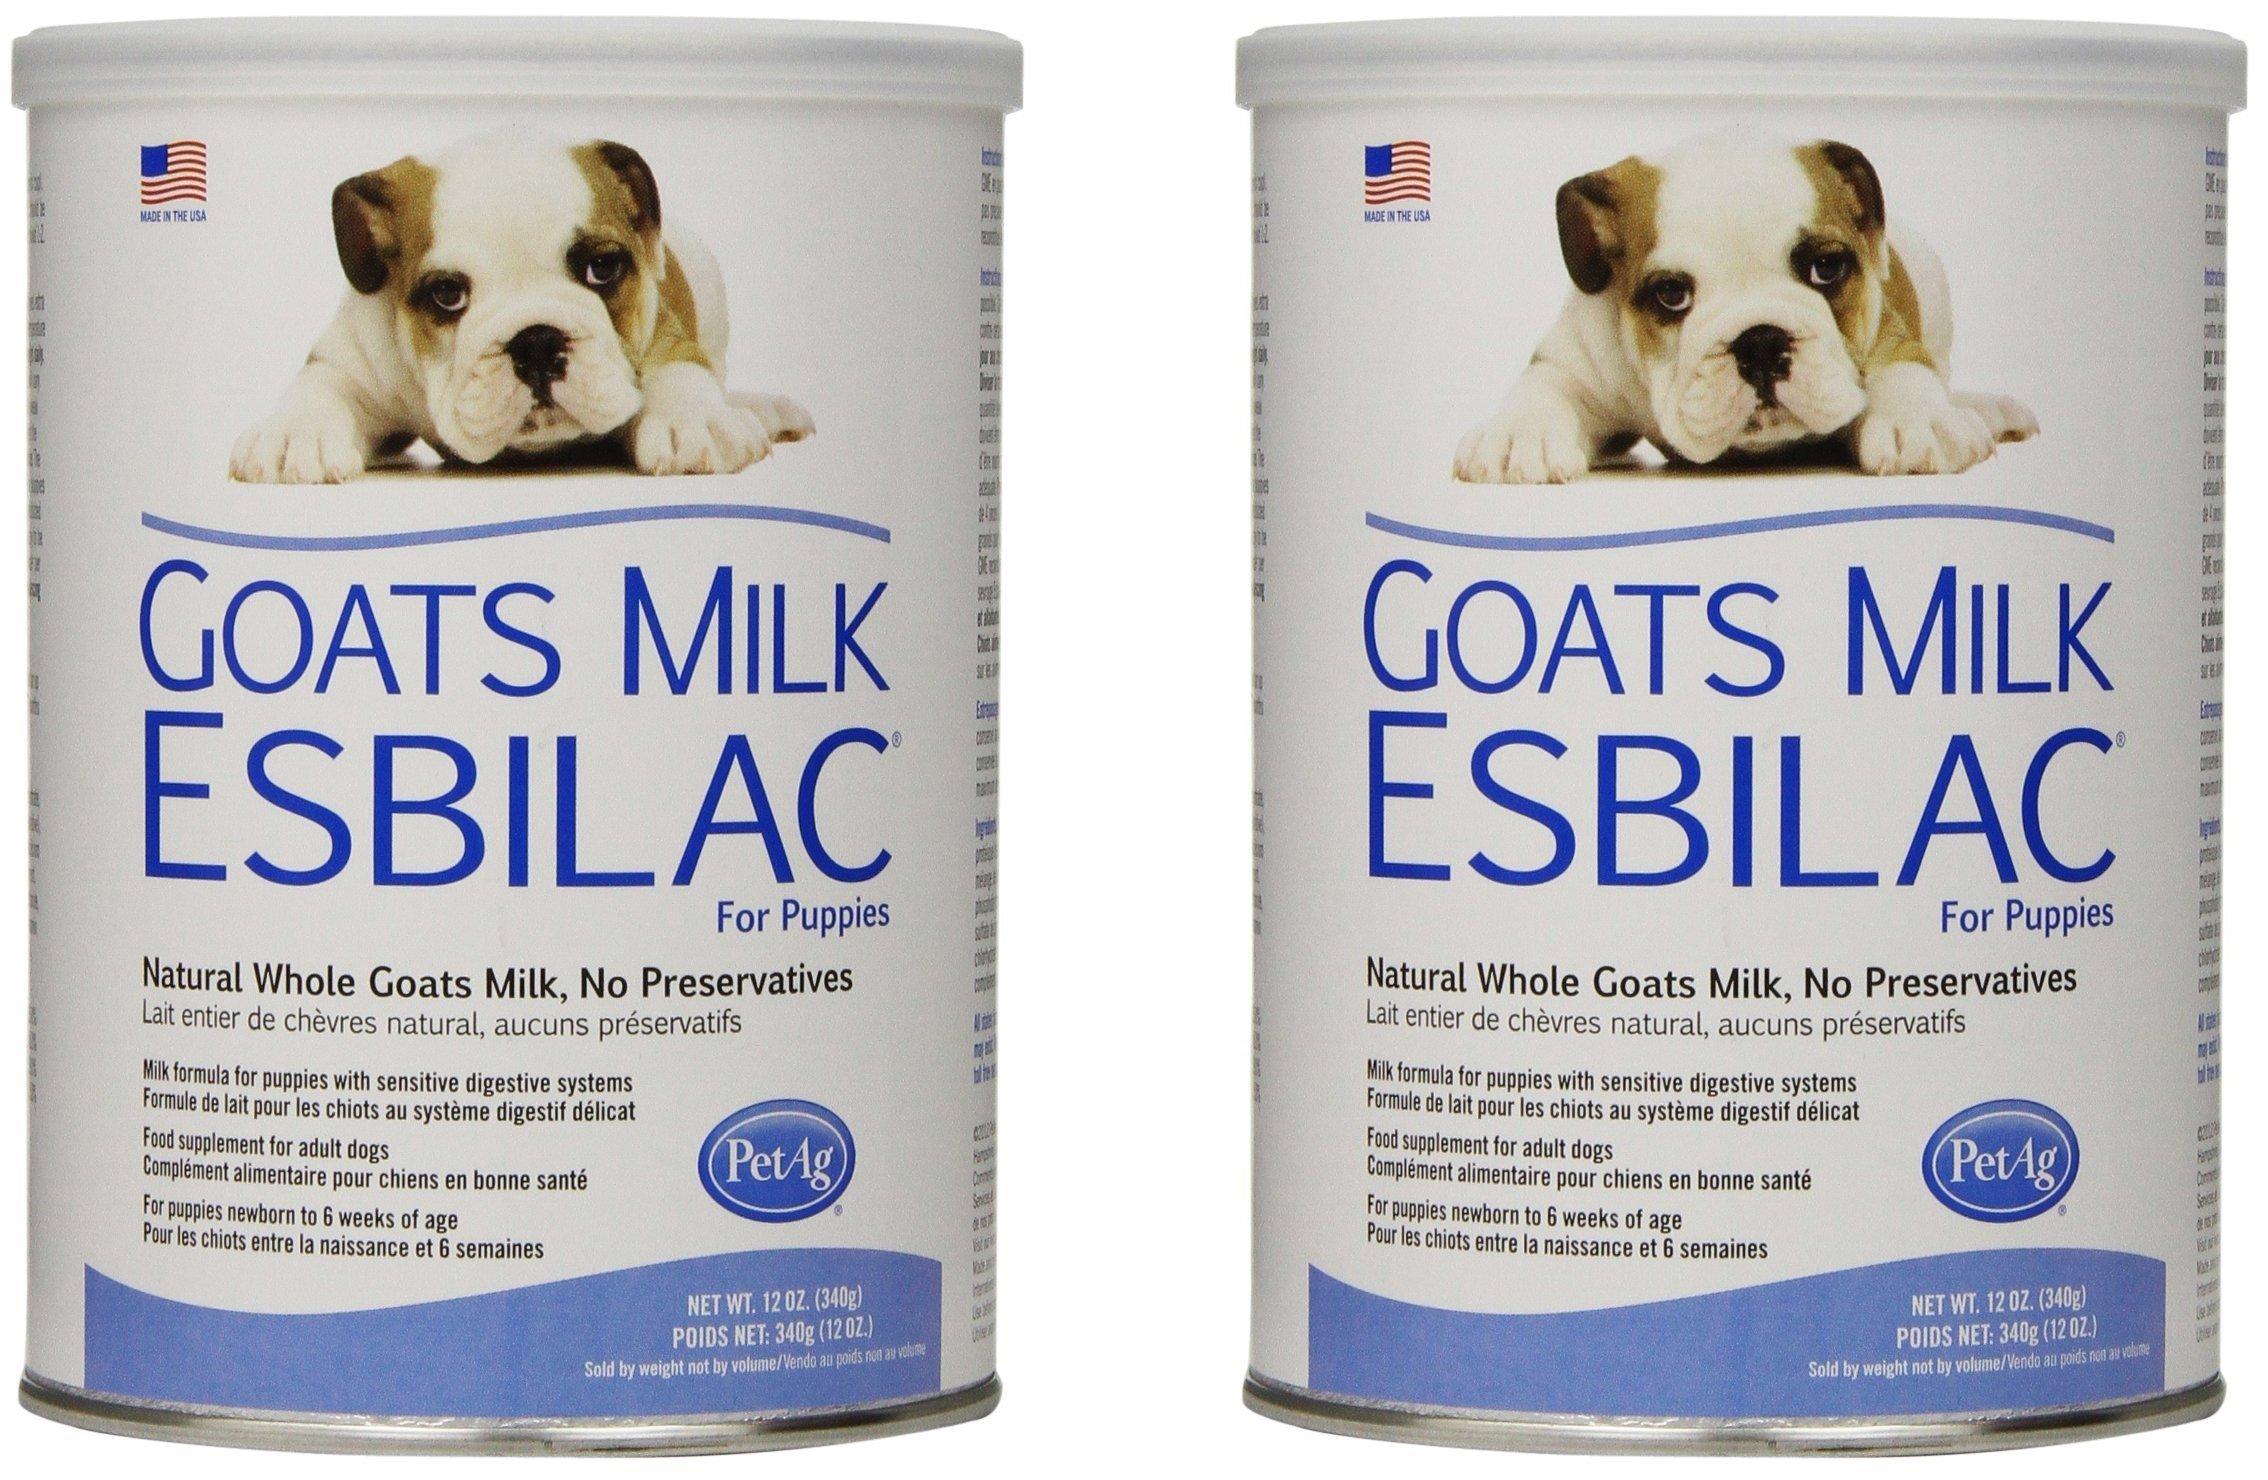 PetAg Goat's Milk Esbilac Powder - 12 Ounce (2 Pack) by Pet Ag